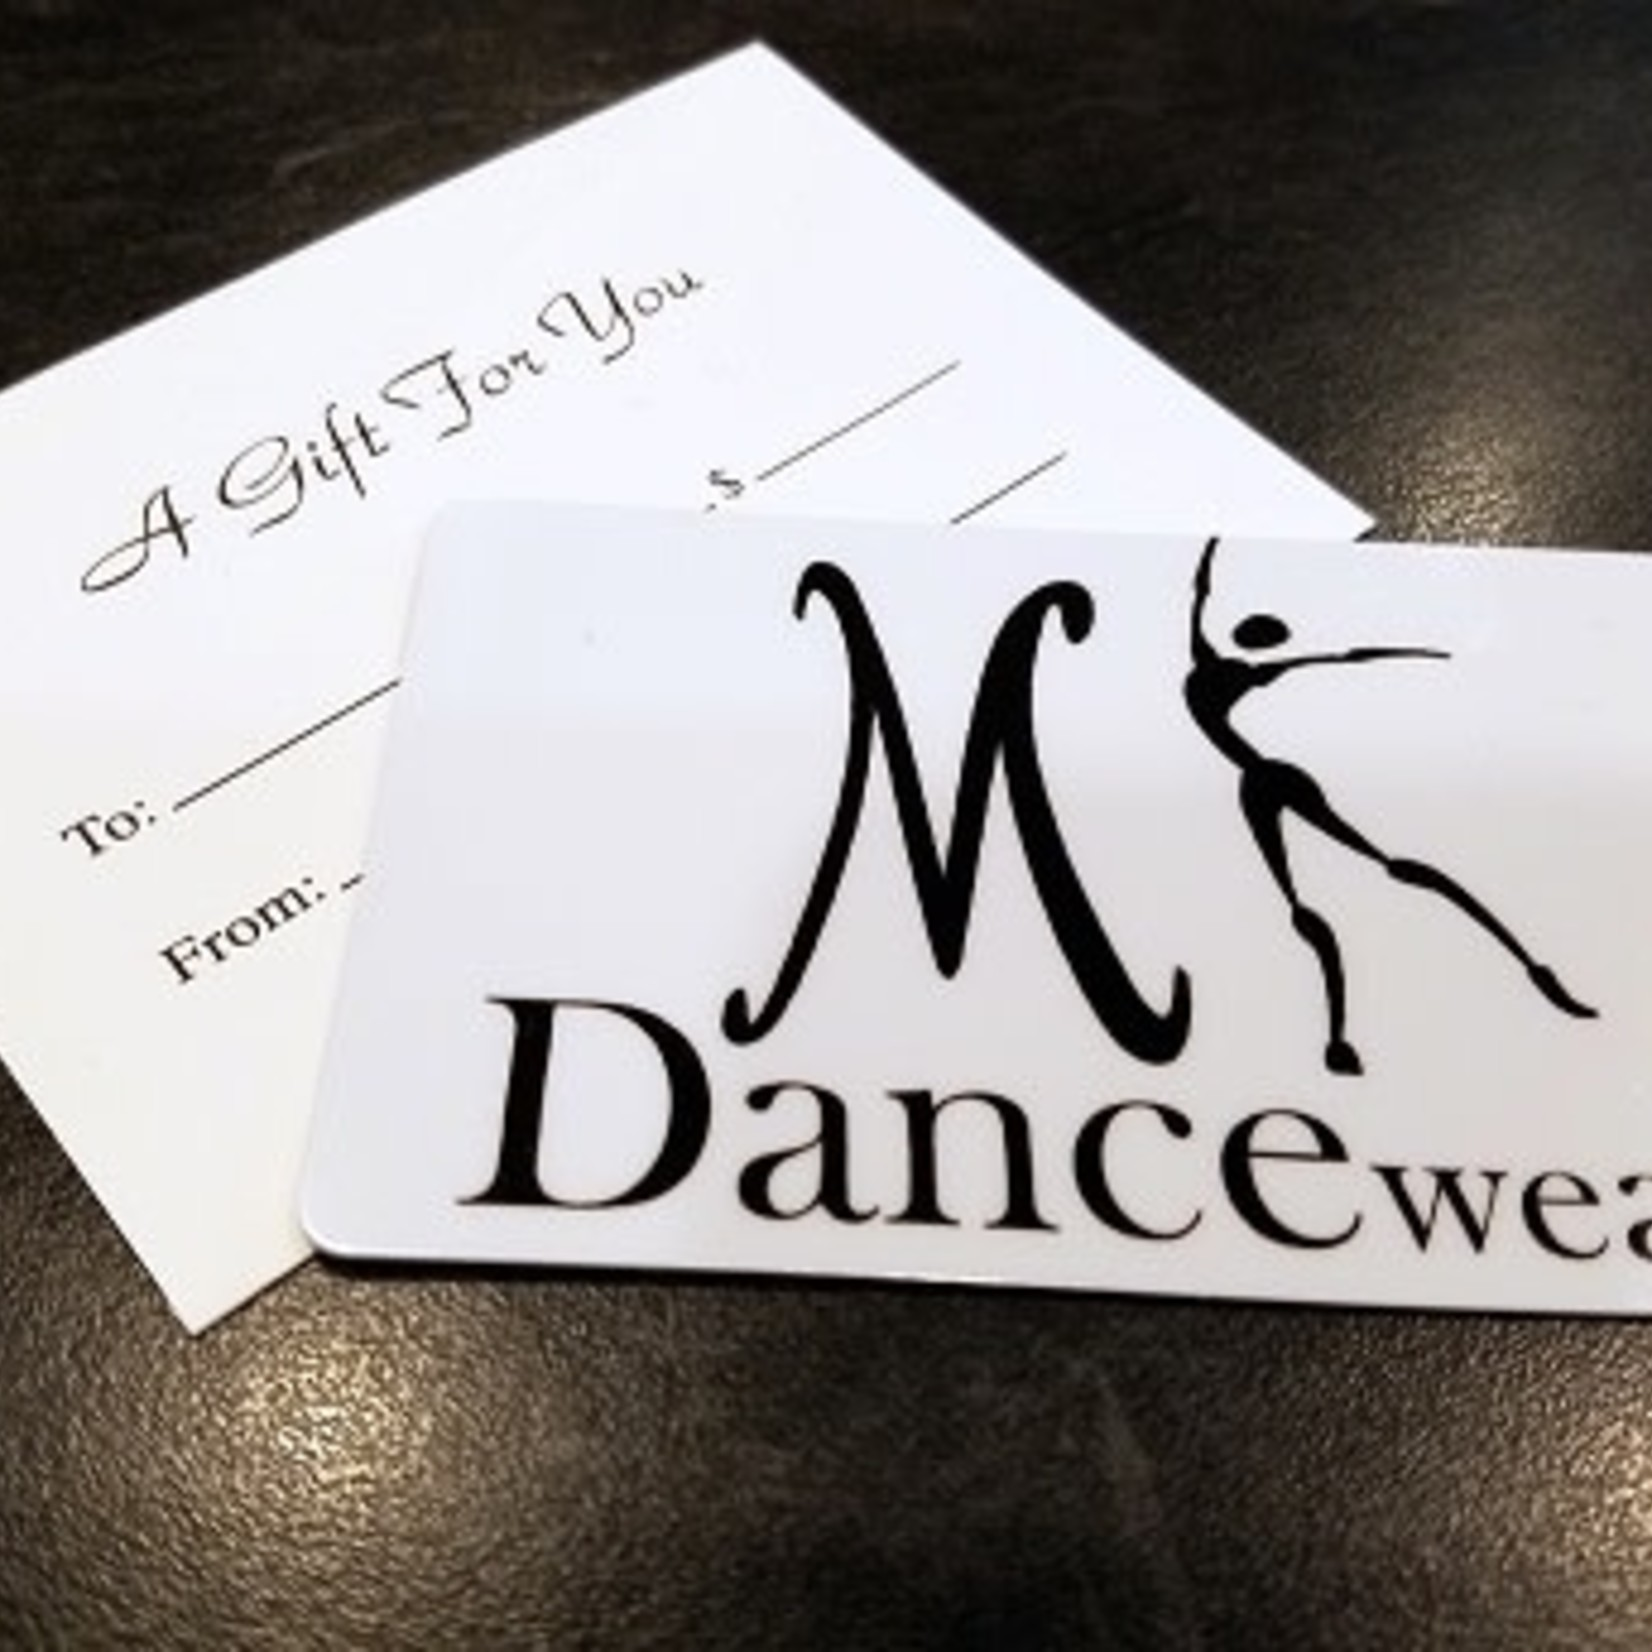 MK Dancewear MK Dancewear Gift Cards $100